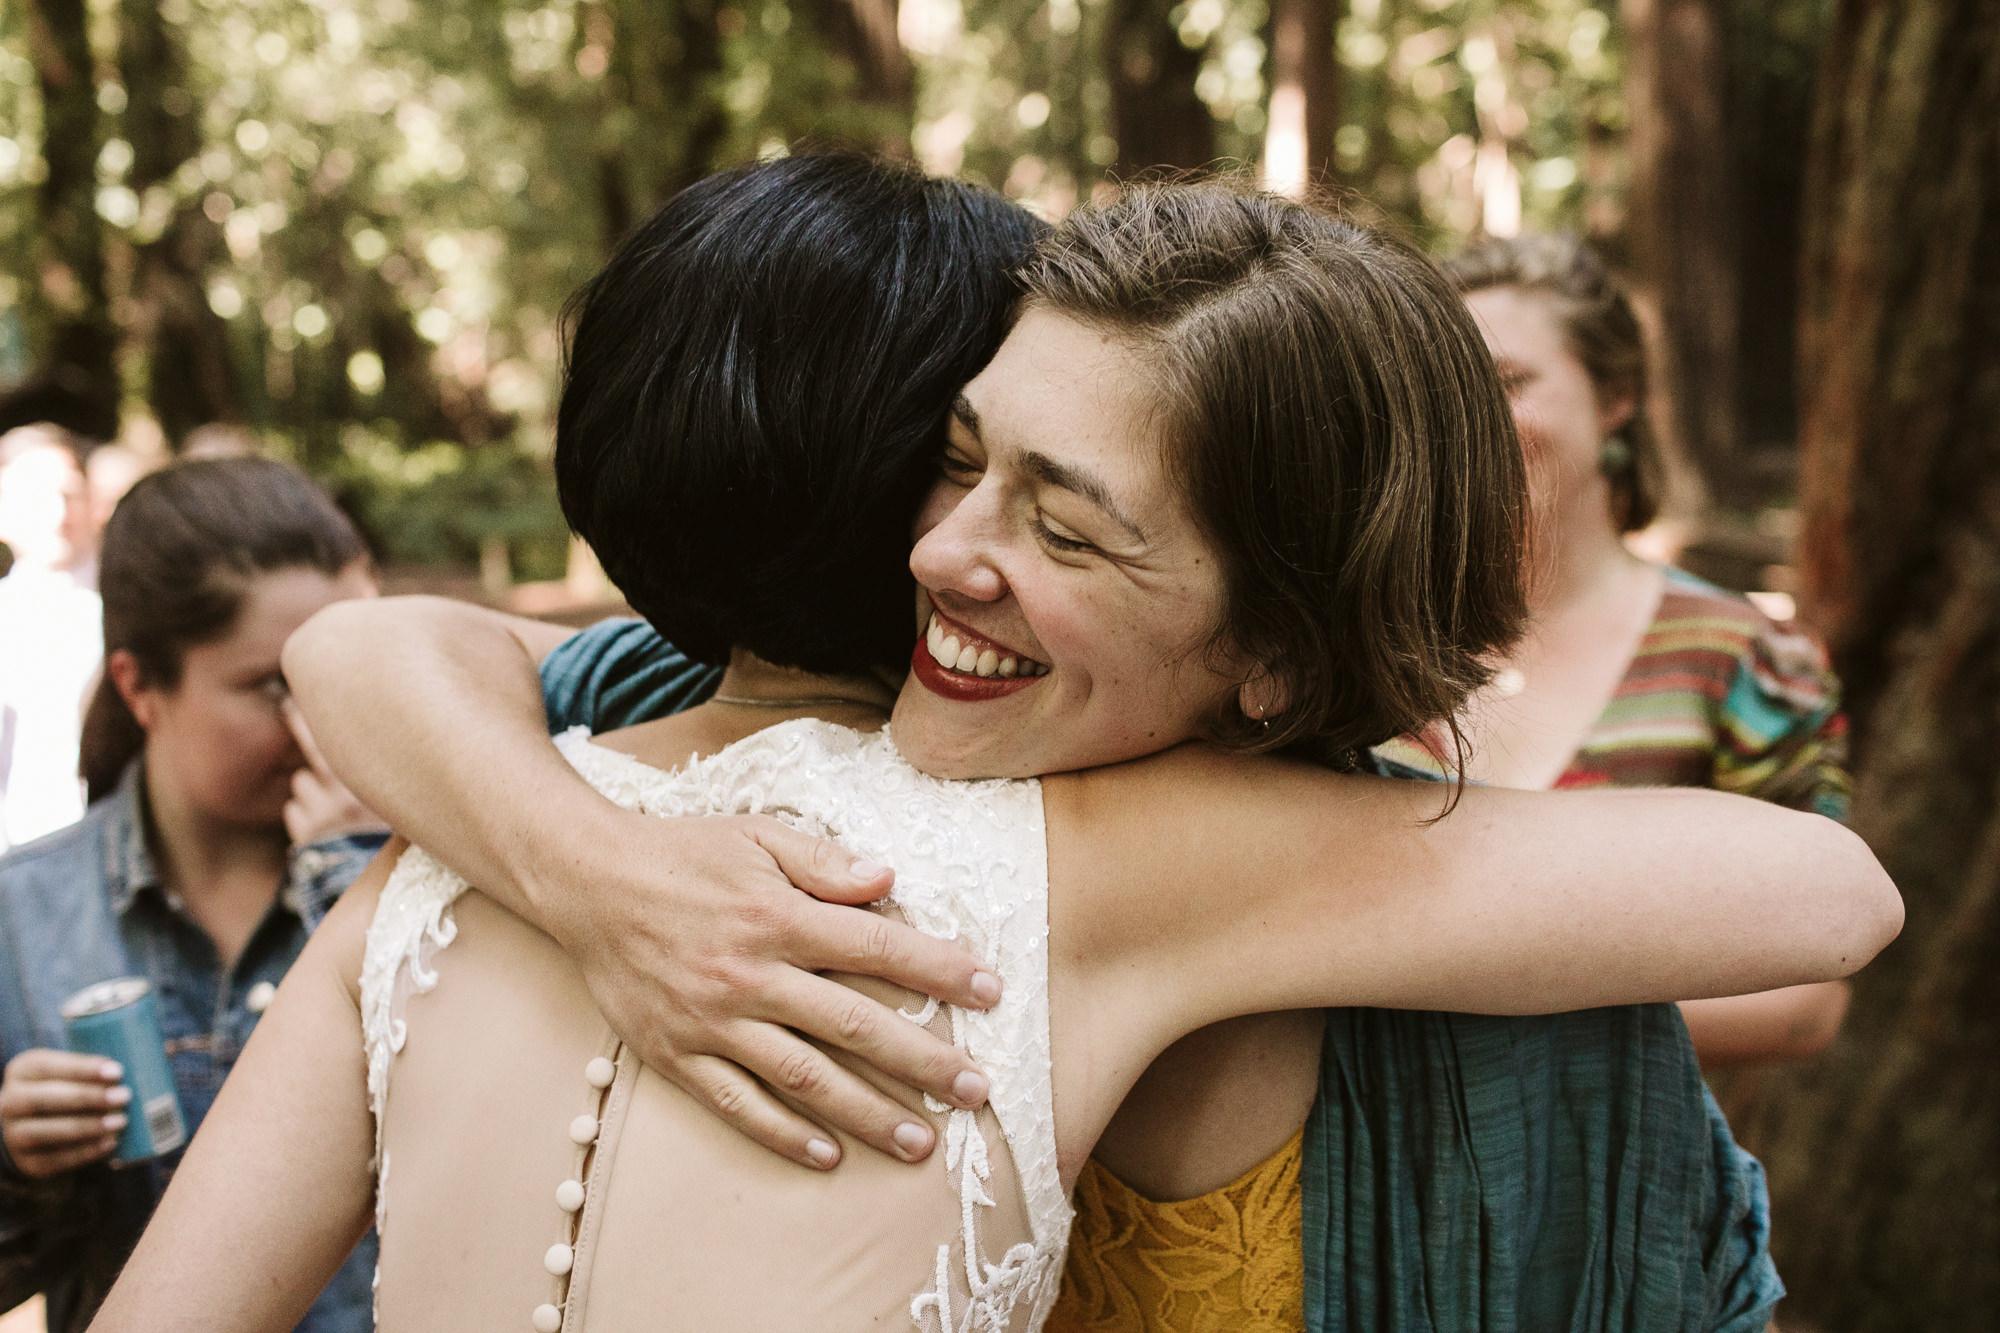 California-wedding-photographer-alfonso-flores-pamplin-groove-232.jpg